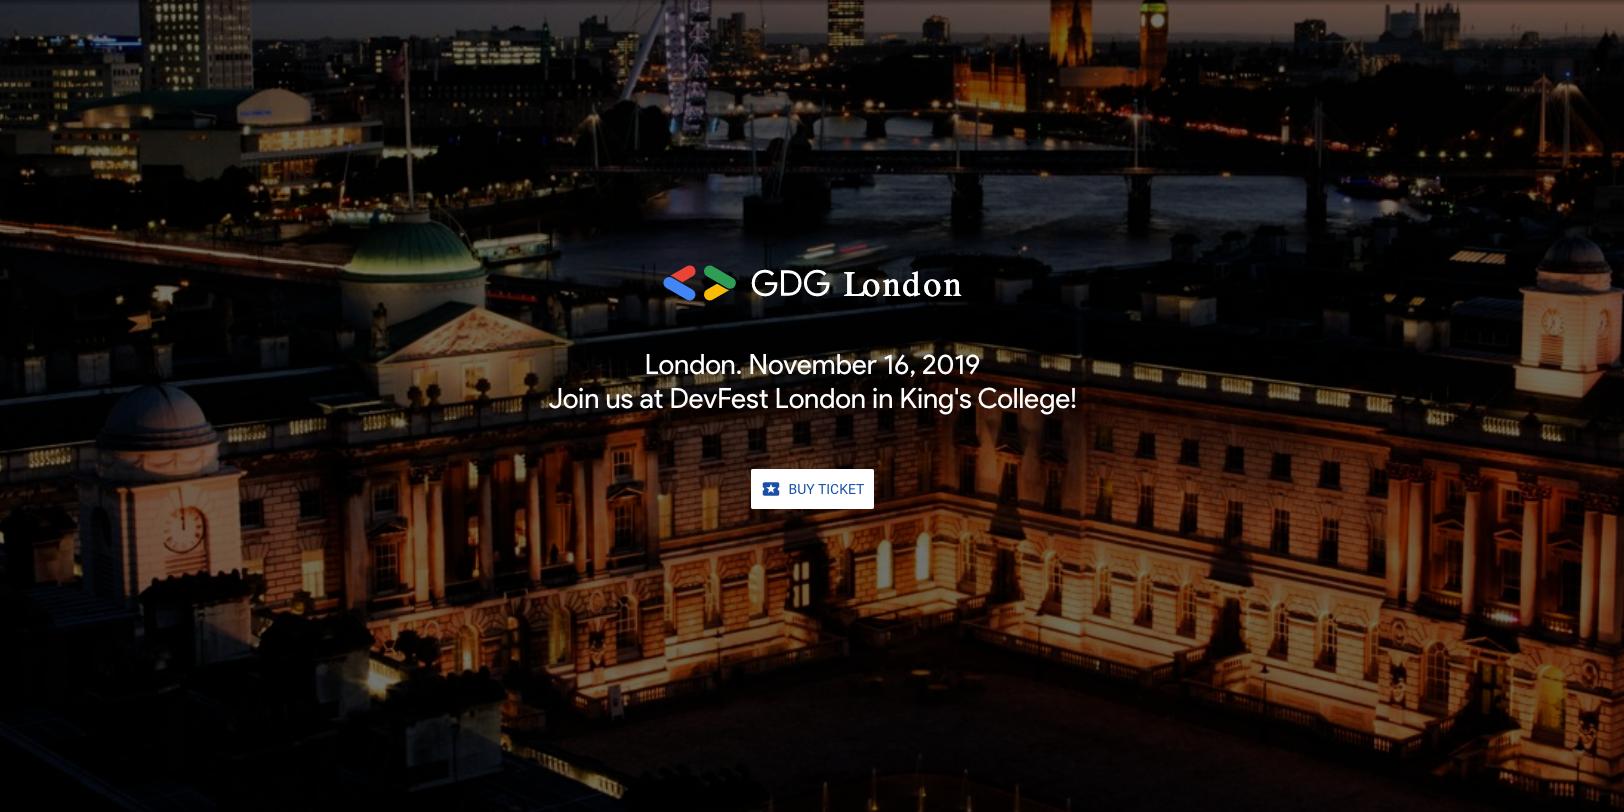 gdg-london